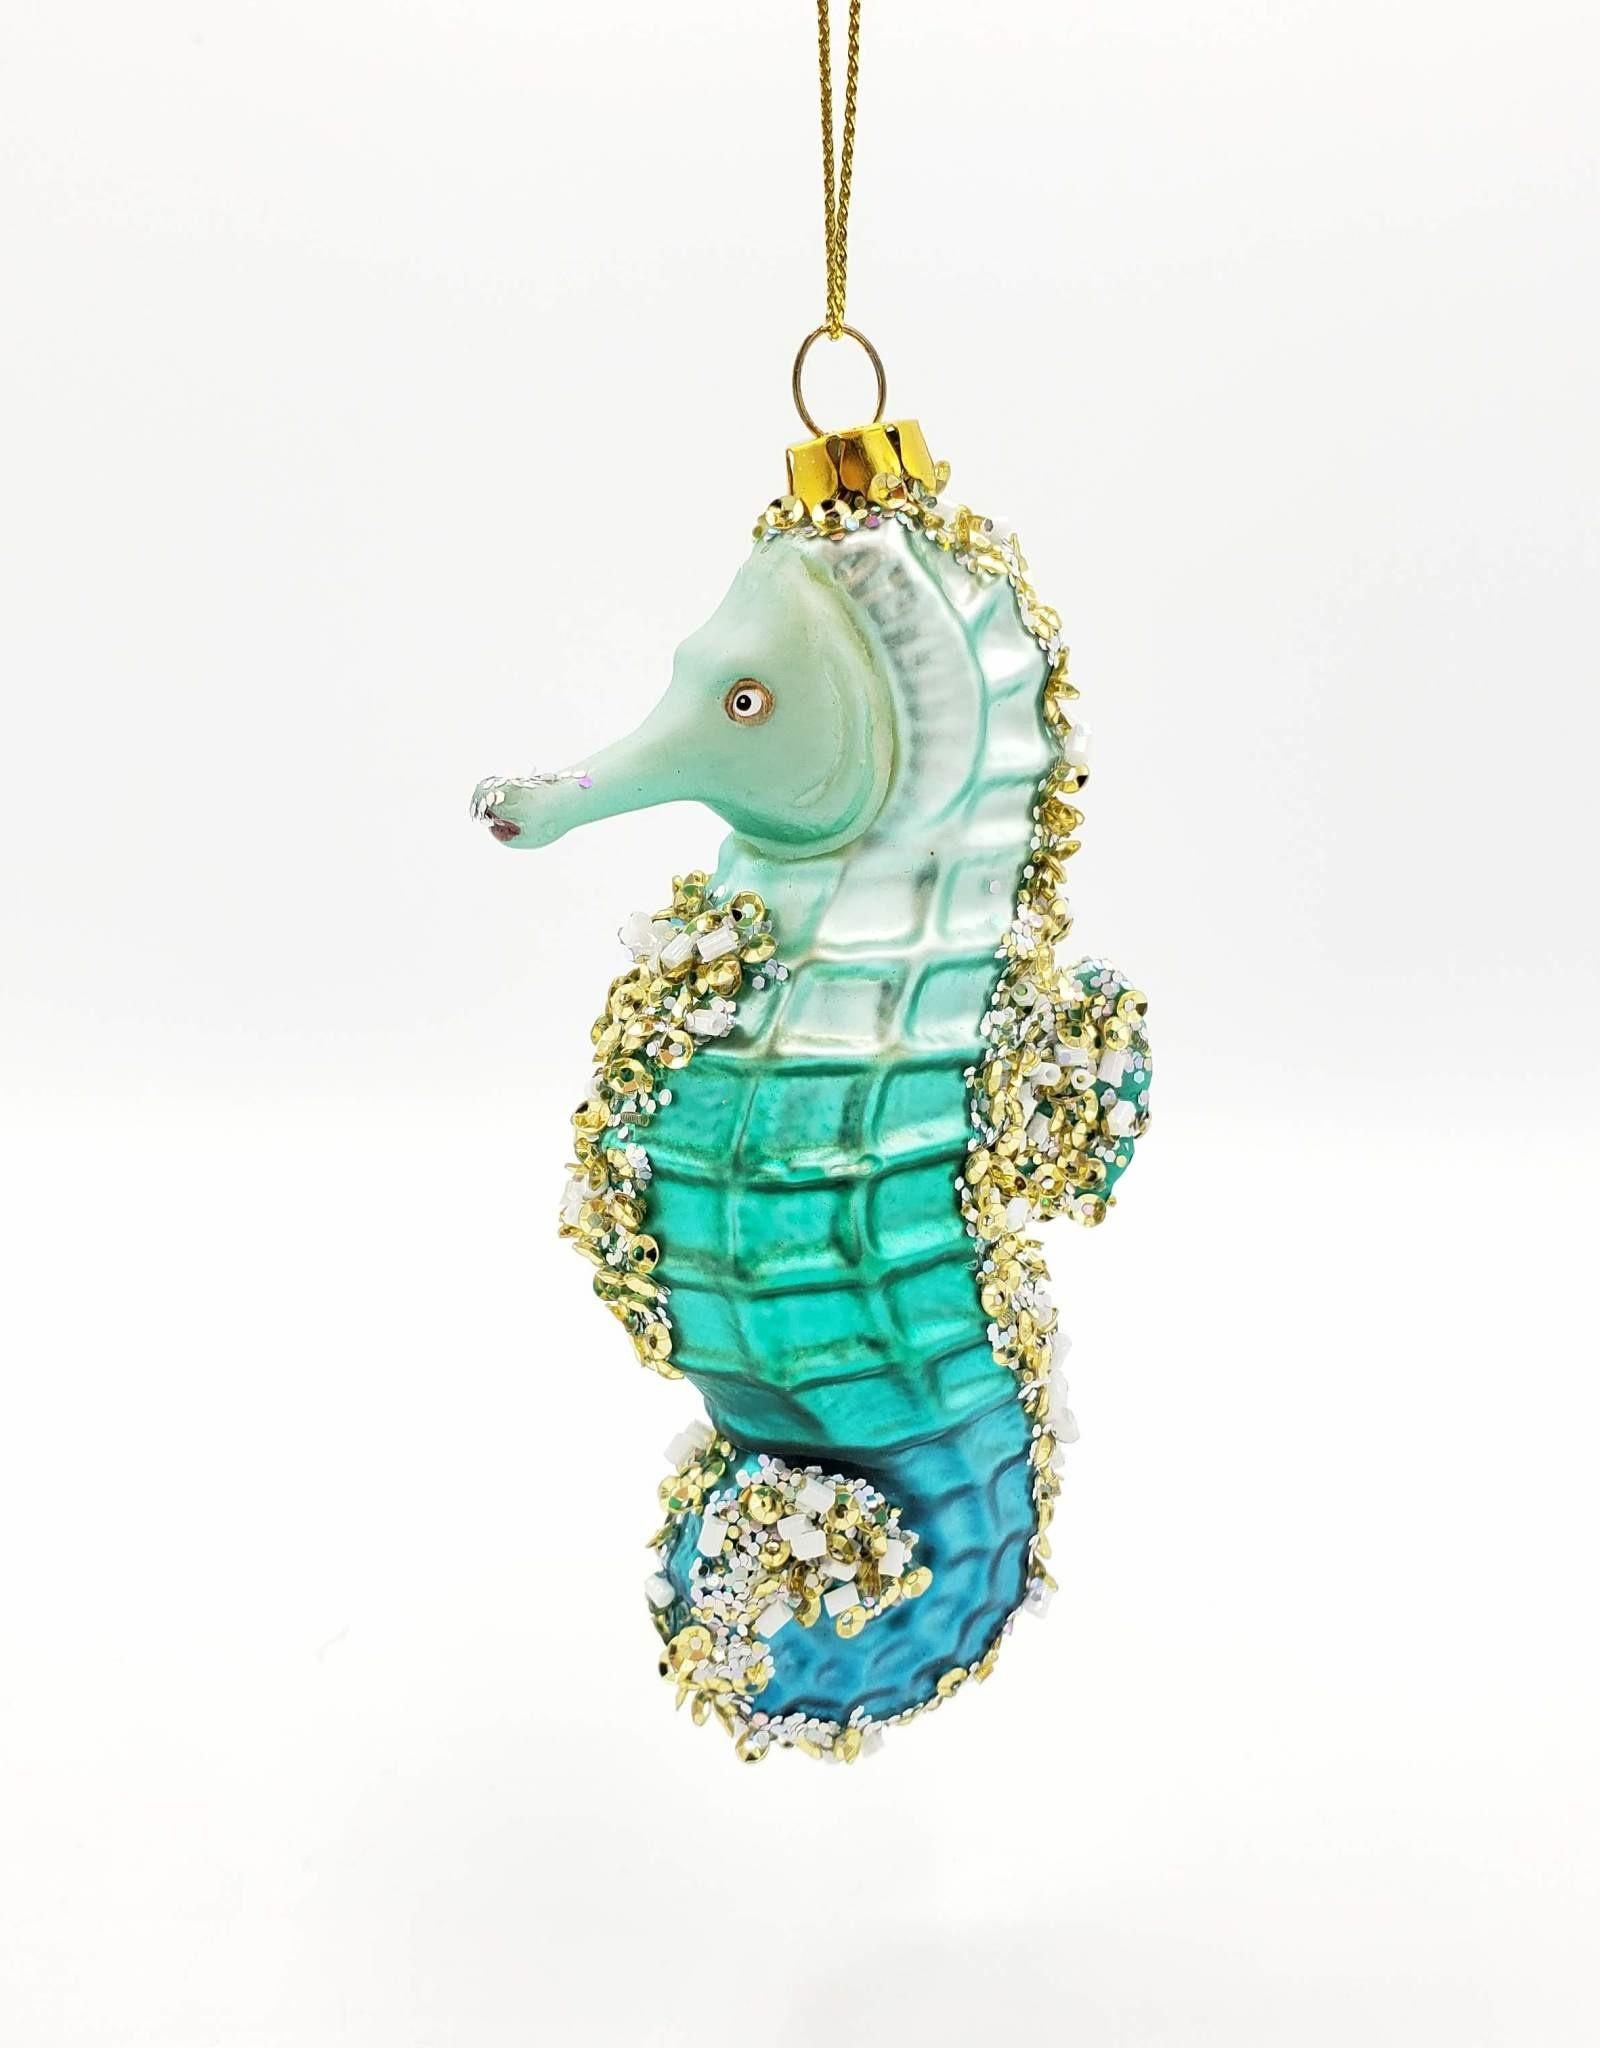 Glass Seahorse Ornament